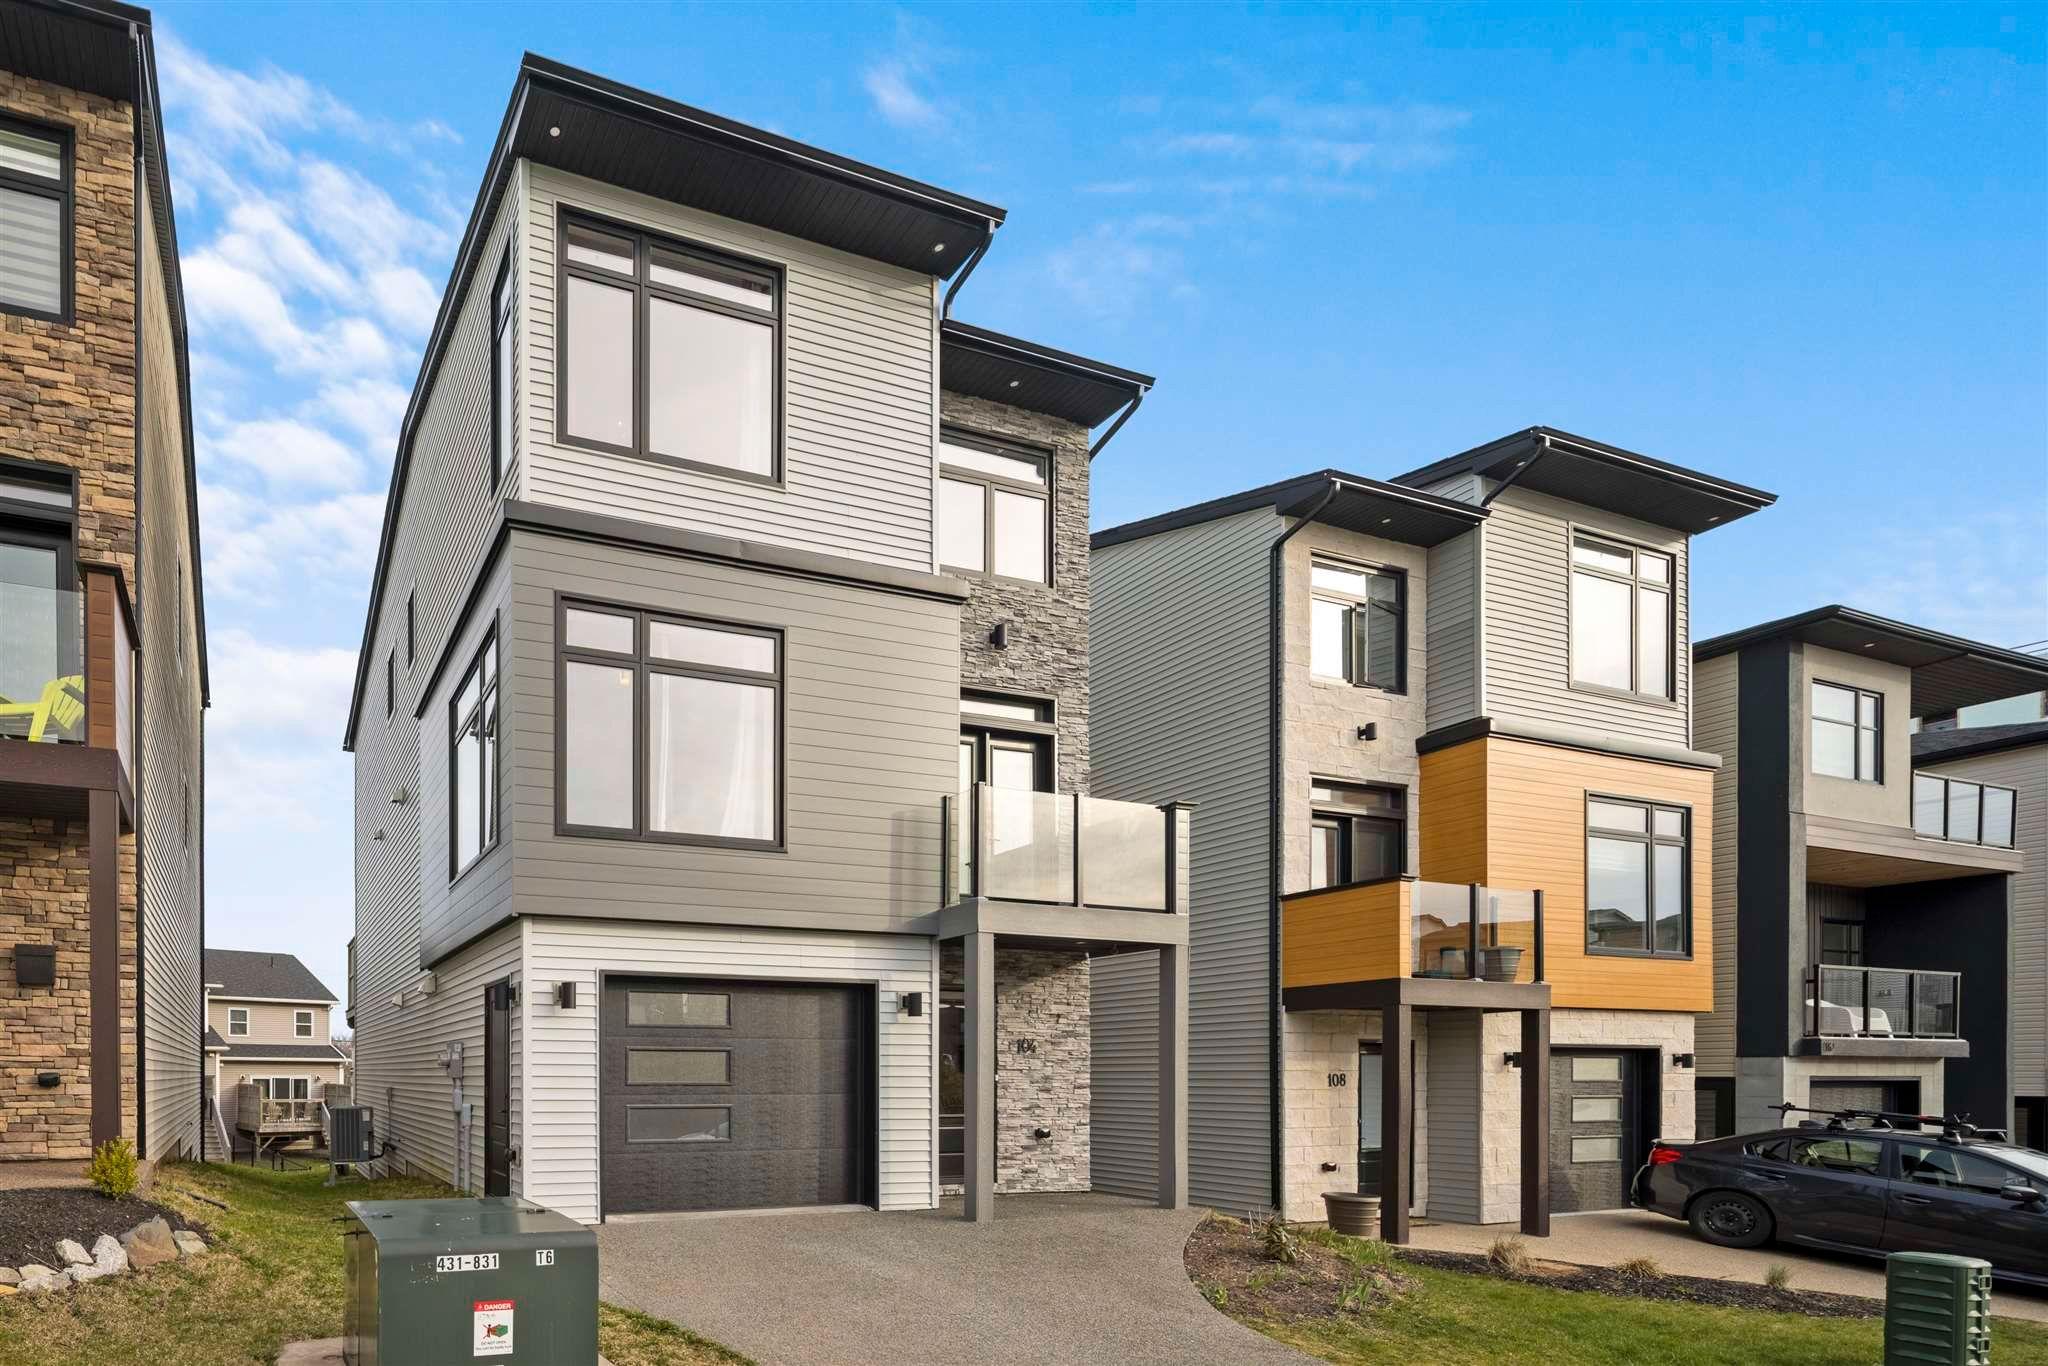 Main Photo: 104 Hadley Crescent in Halifax: 7-Spryfield Residential for sale (Halifax-Dartmouth)  : MLS®# 202110342